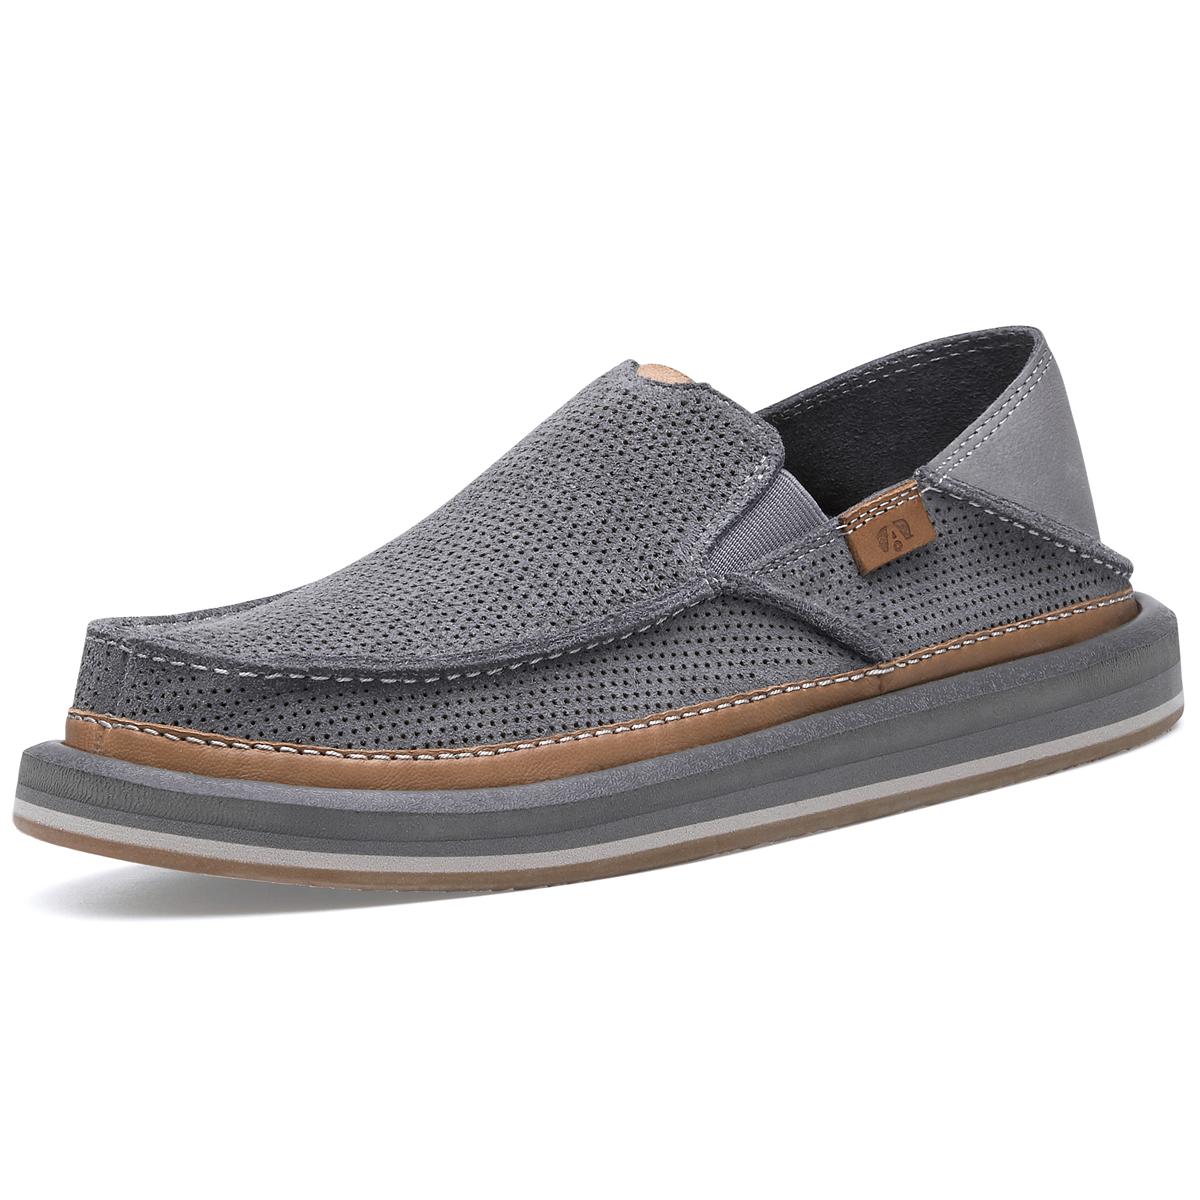 Sanuk-Shoe-Vagabond-St-X-Airstream-Leather-Grey